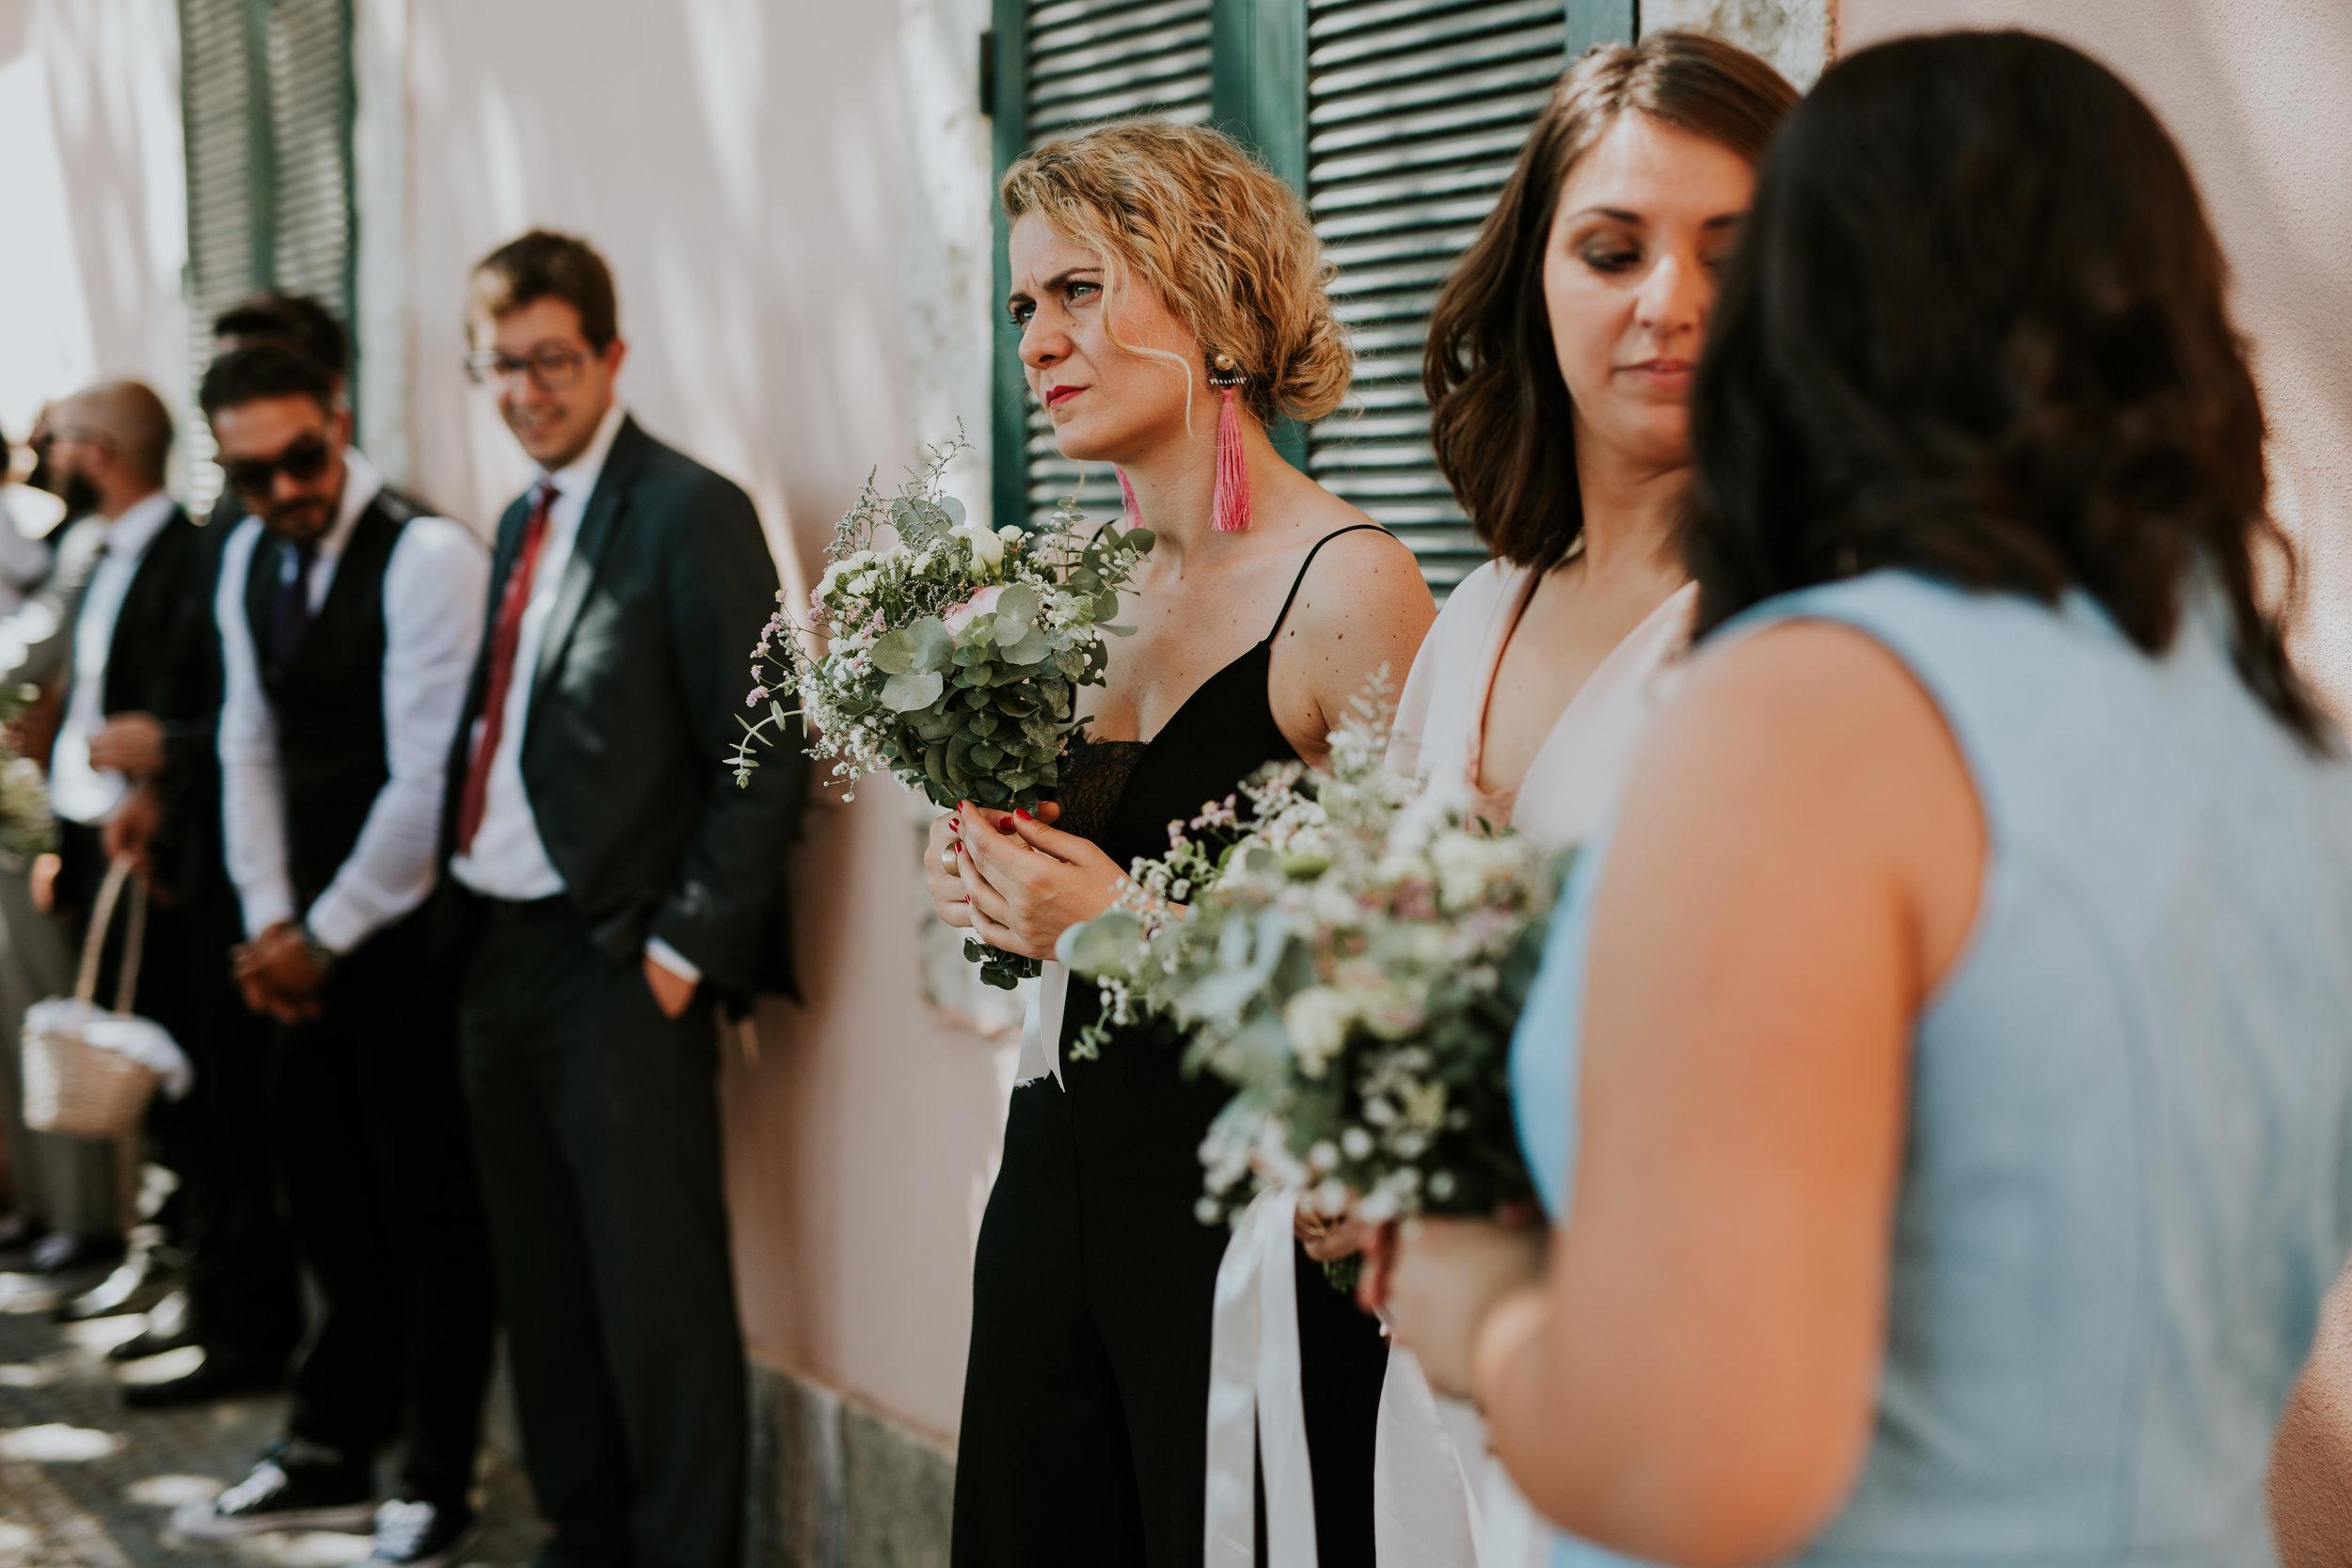 J&P 264_ 02 setembro 2017 Wedding day_.jpg